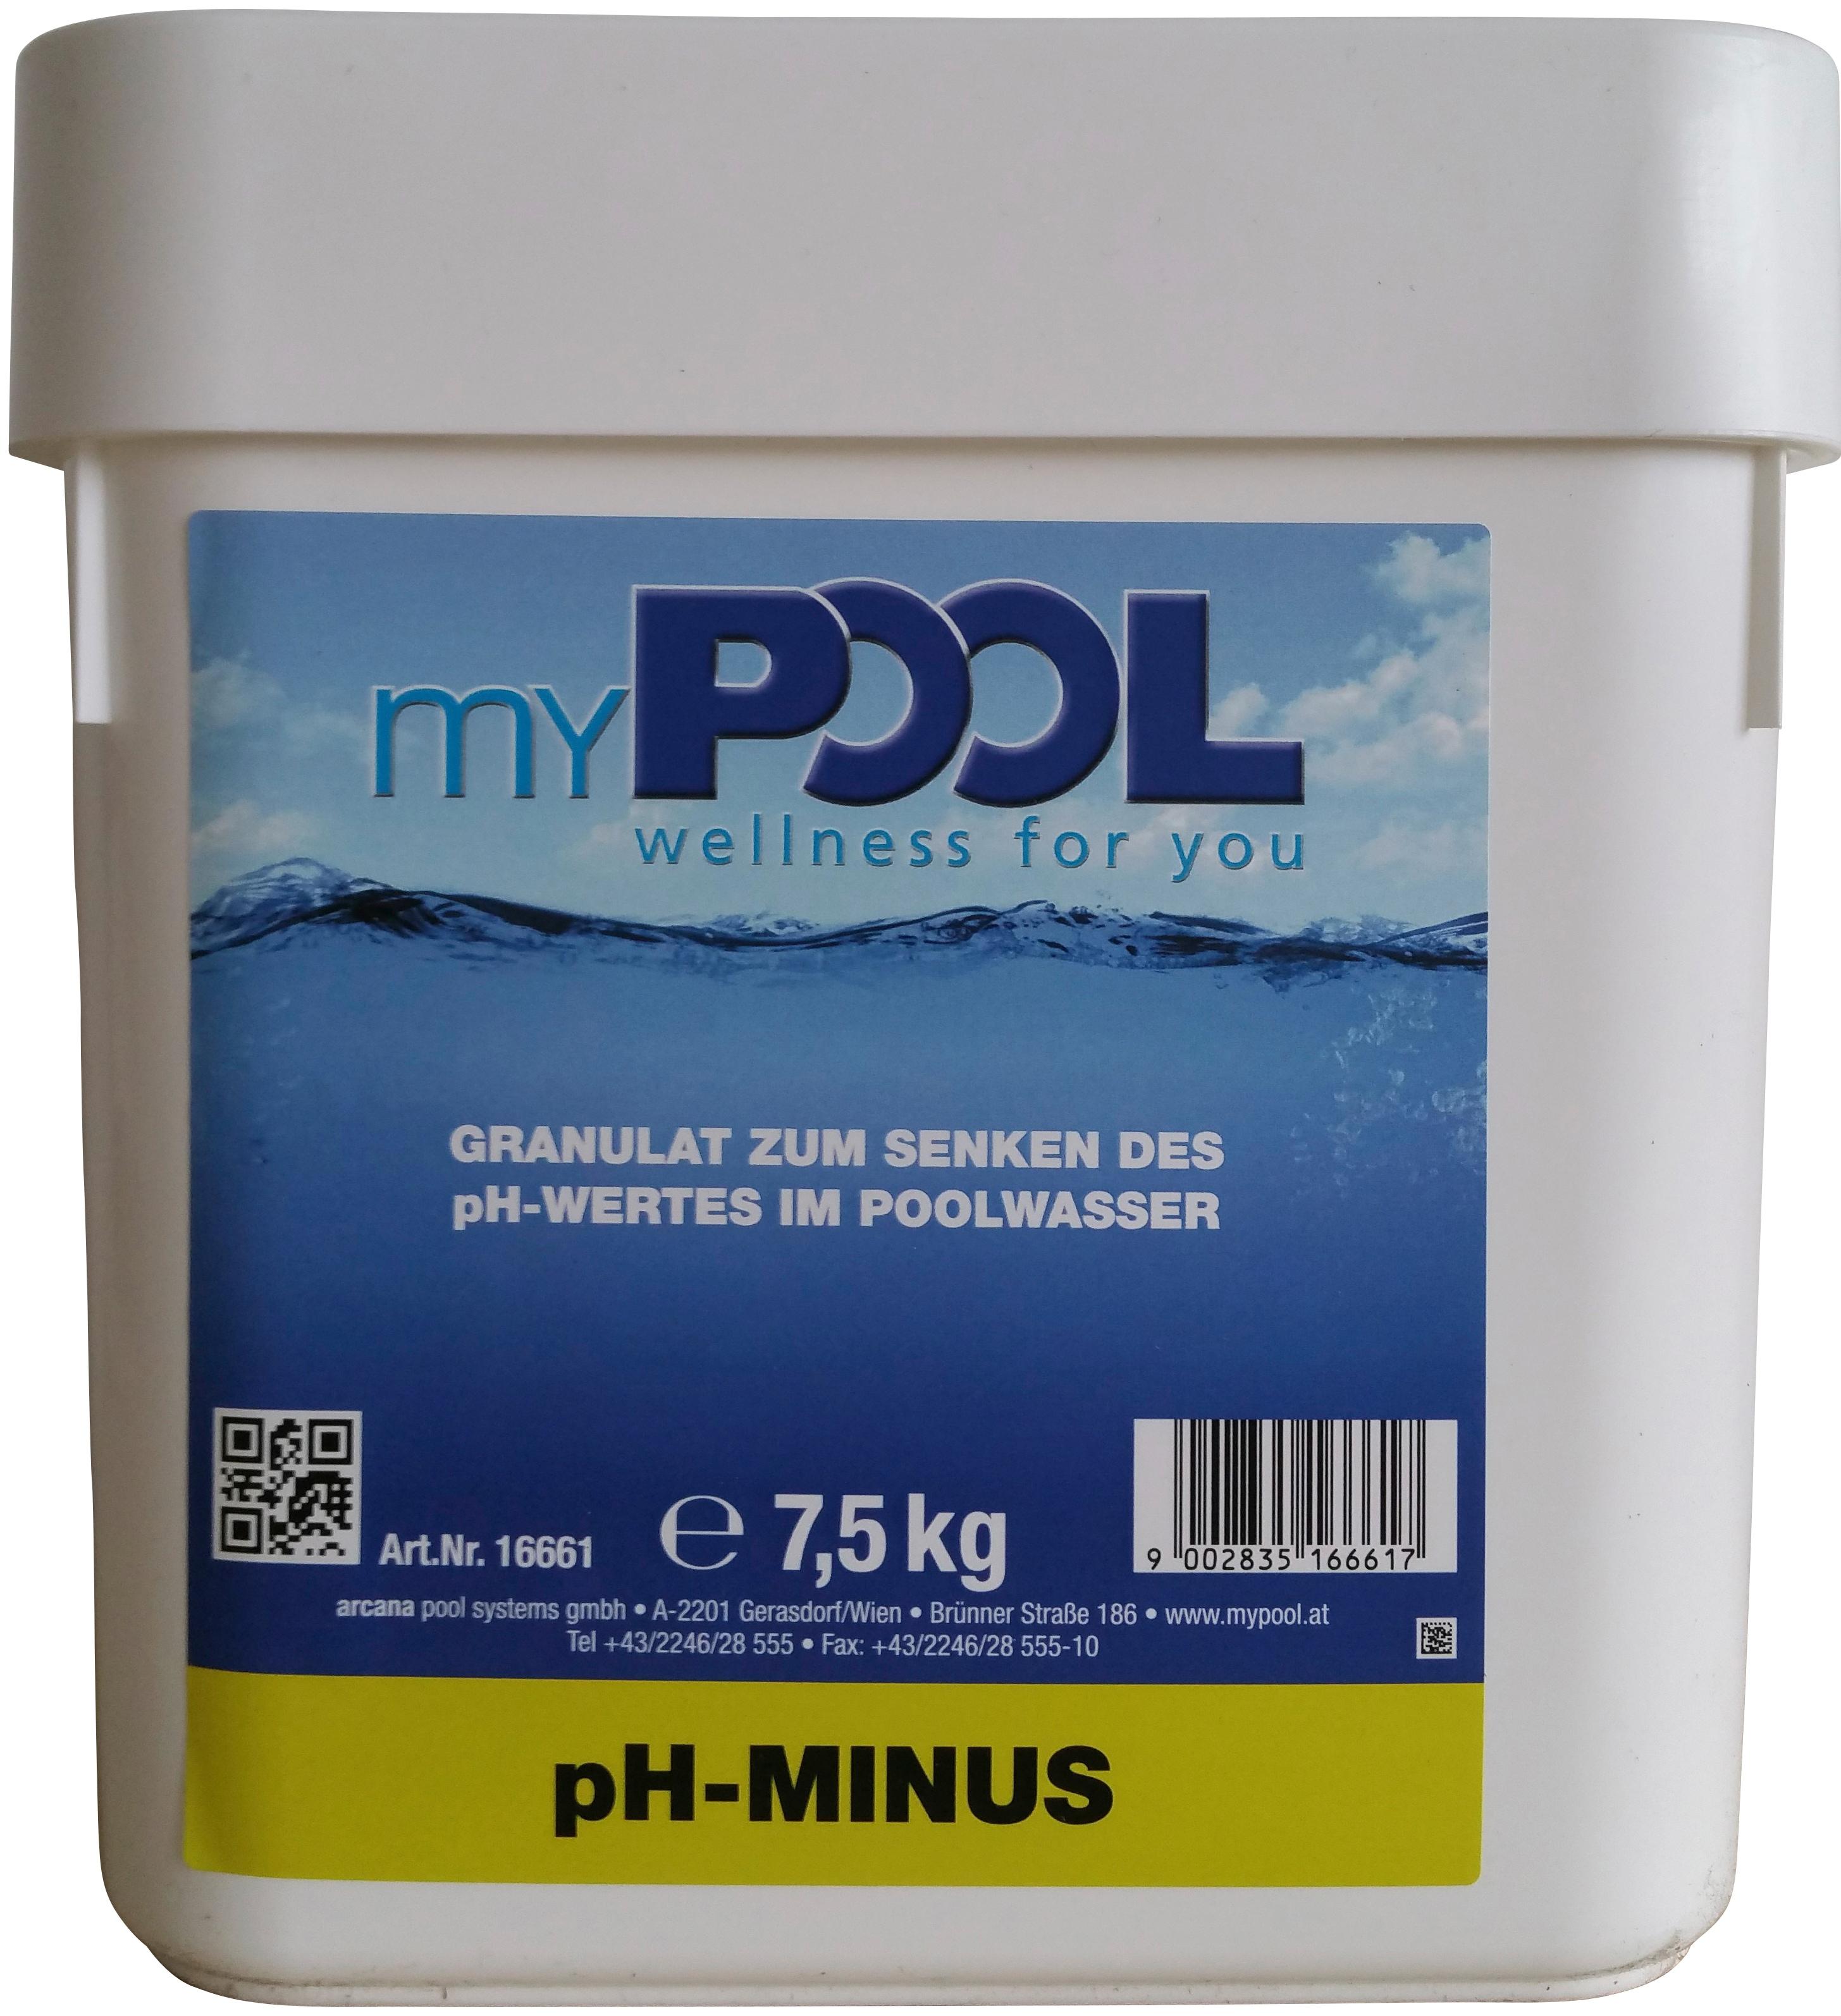 MYPOOL Poolpflege »pH-minus«, 7,5 kg | Garten > Swimmingpools > Poolpflege | Weiß | MYPOOL